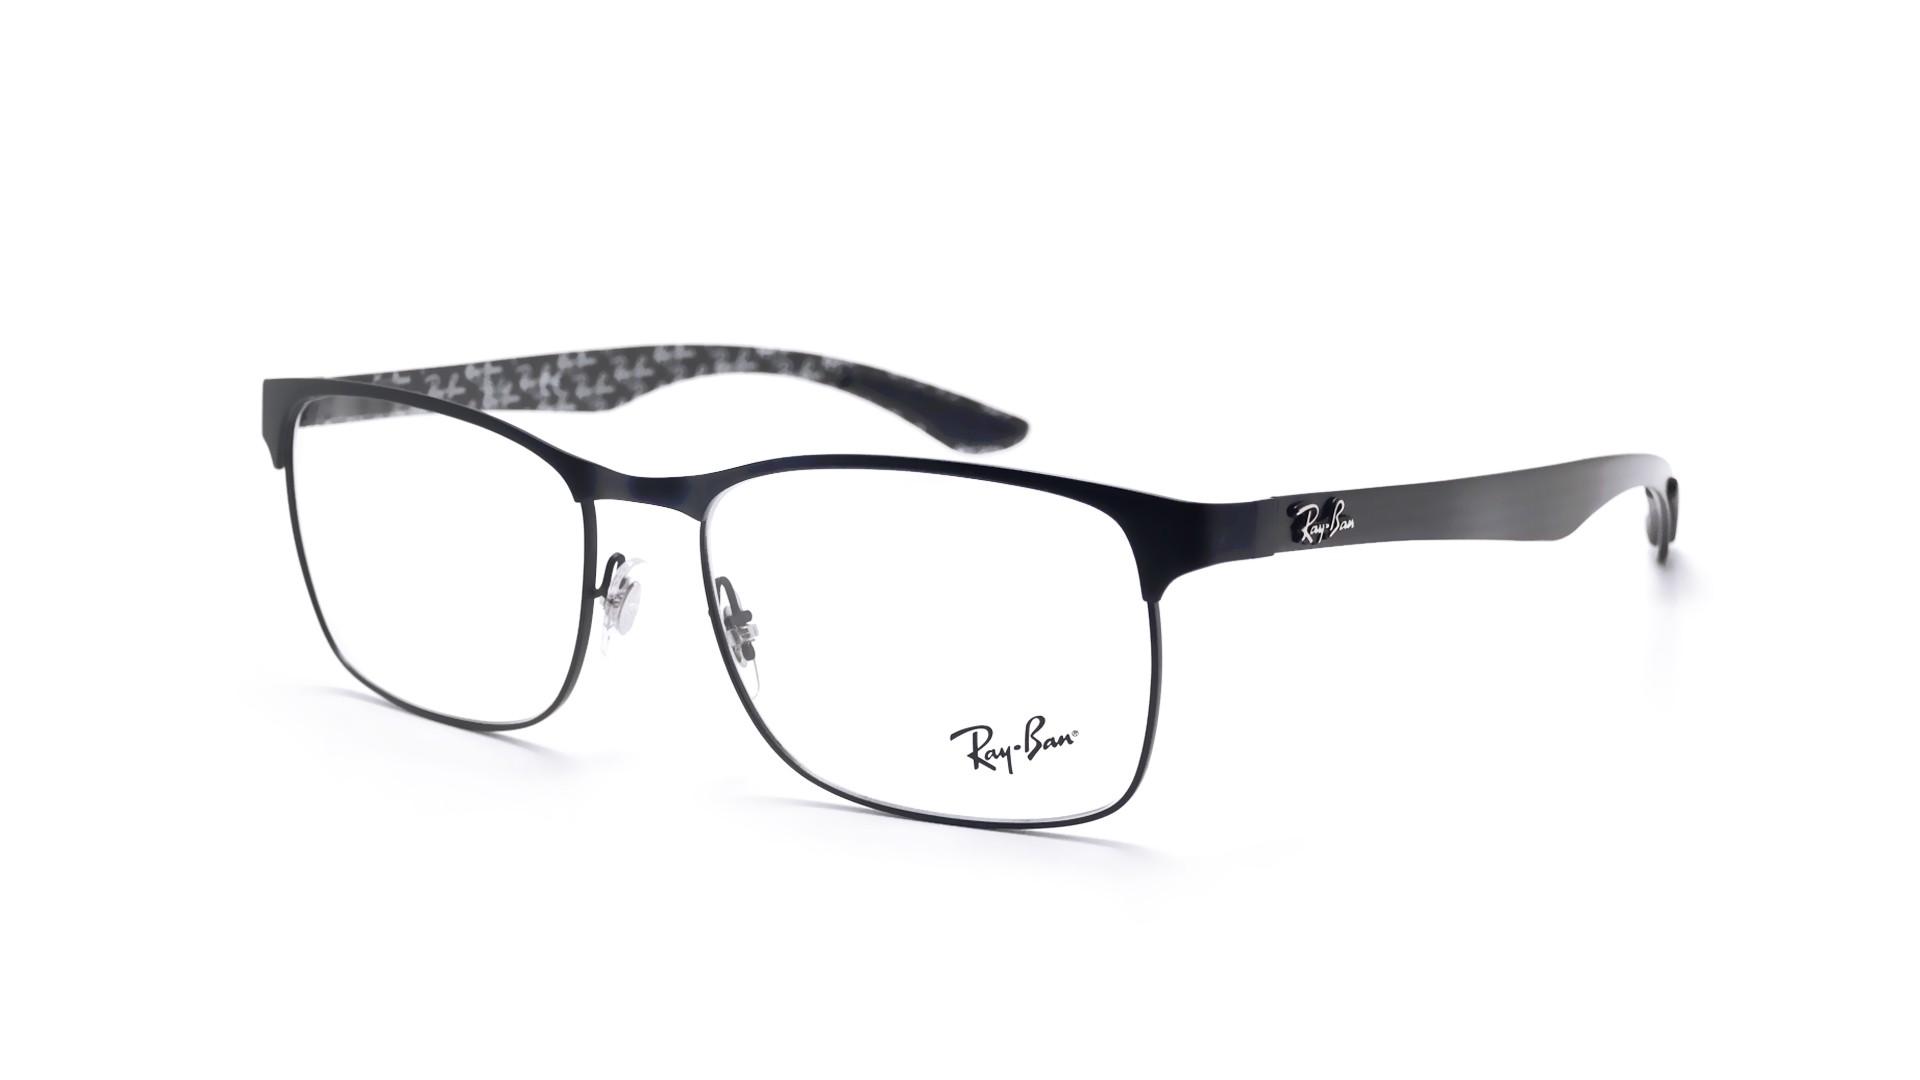 d2b9c44604 Eyeglasses Ray-Ban RX8416 RB8416 2503 55-17 Black Matte Medium